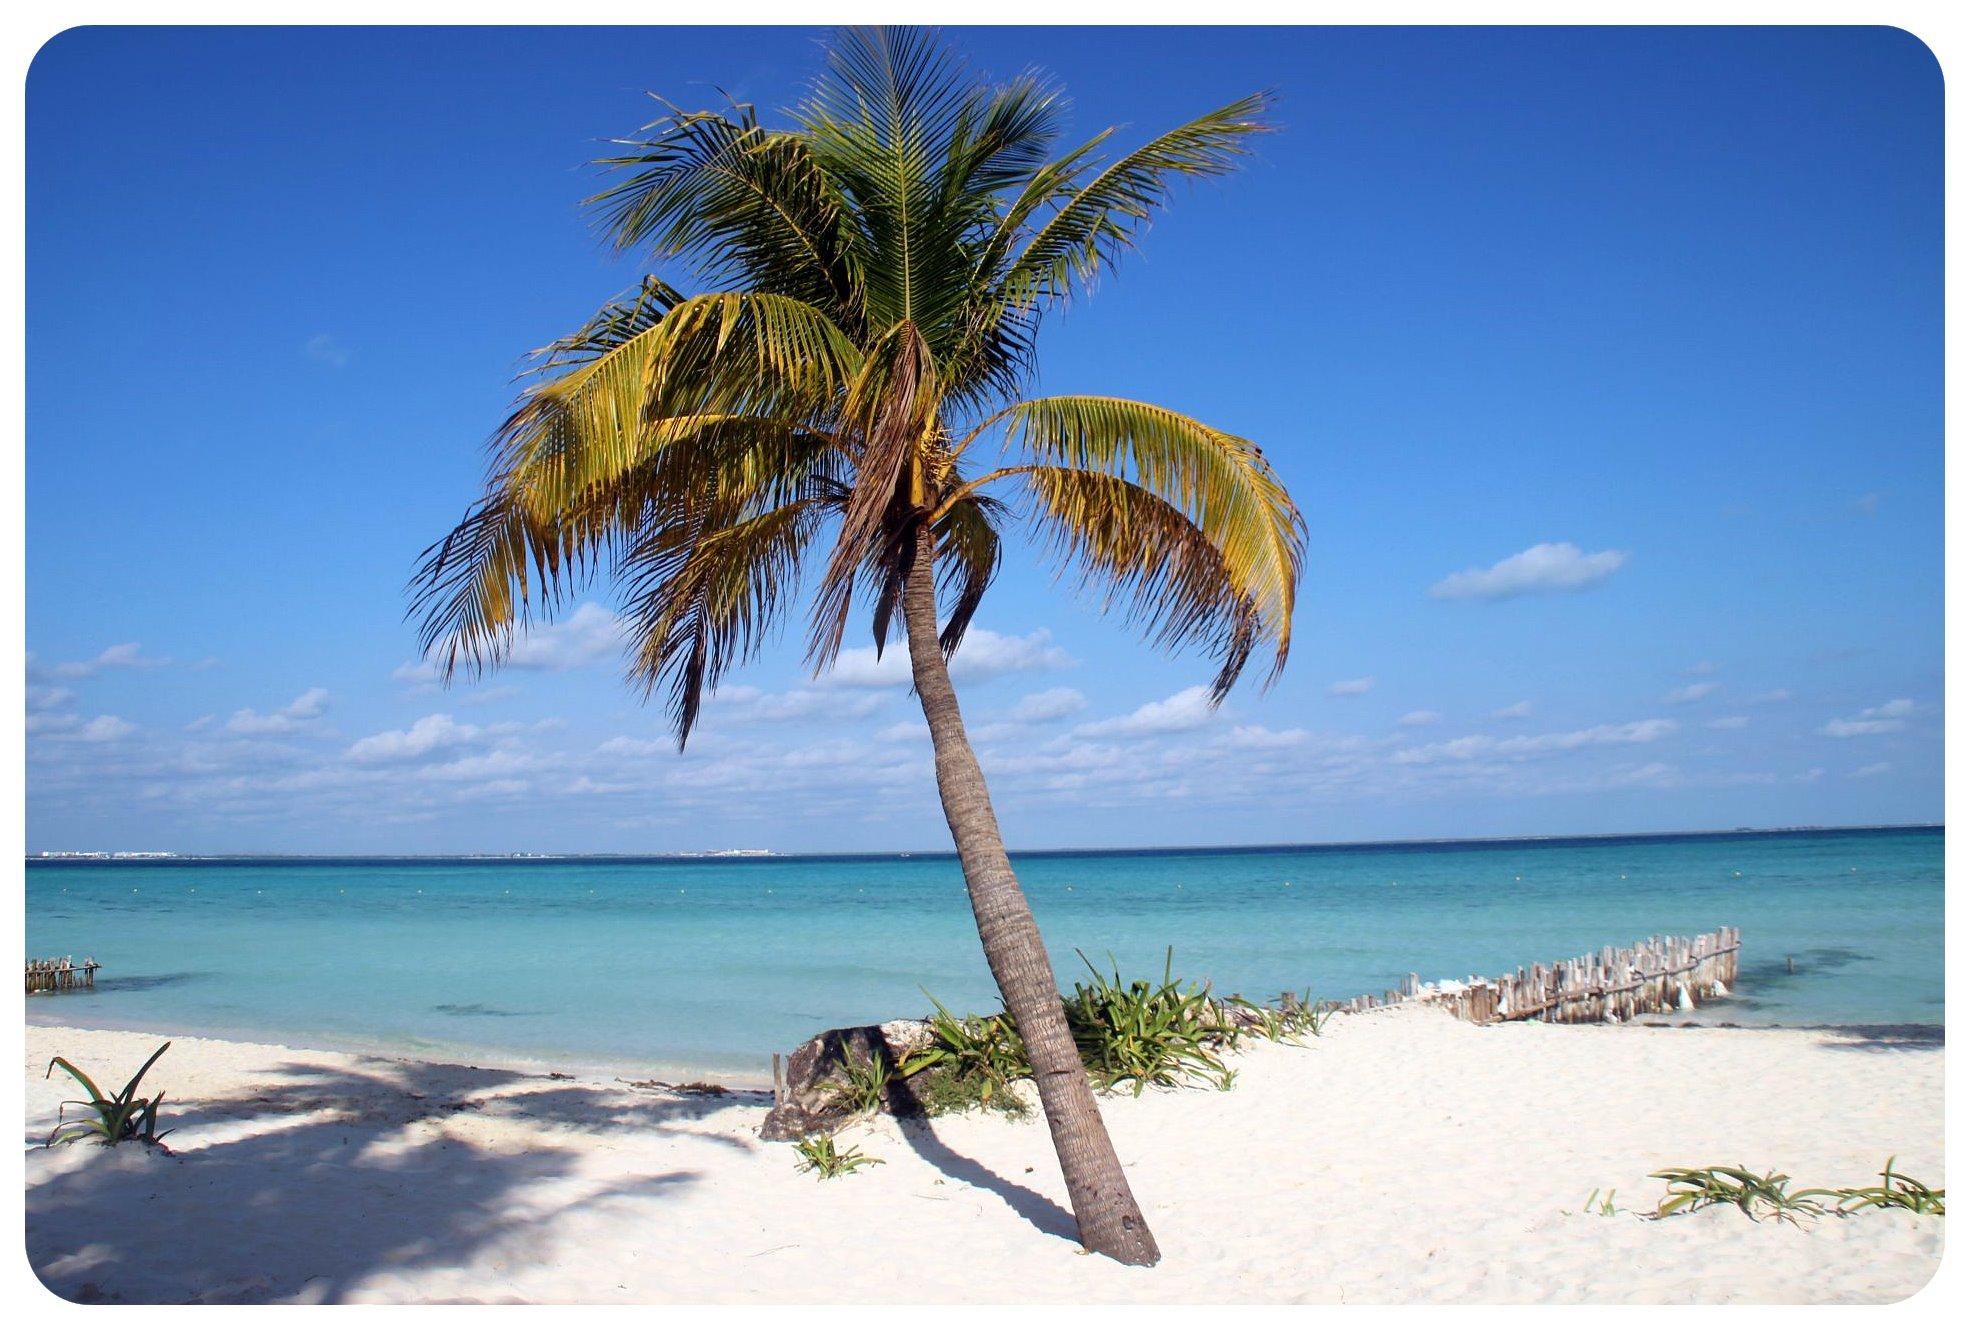 isla mujeres palm tree